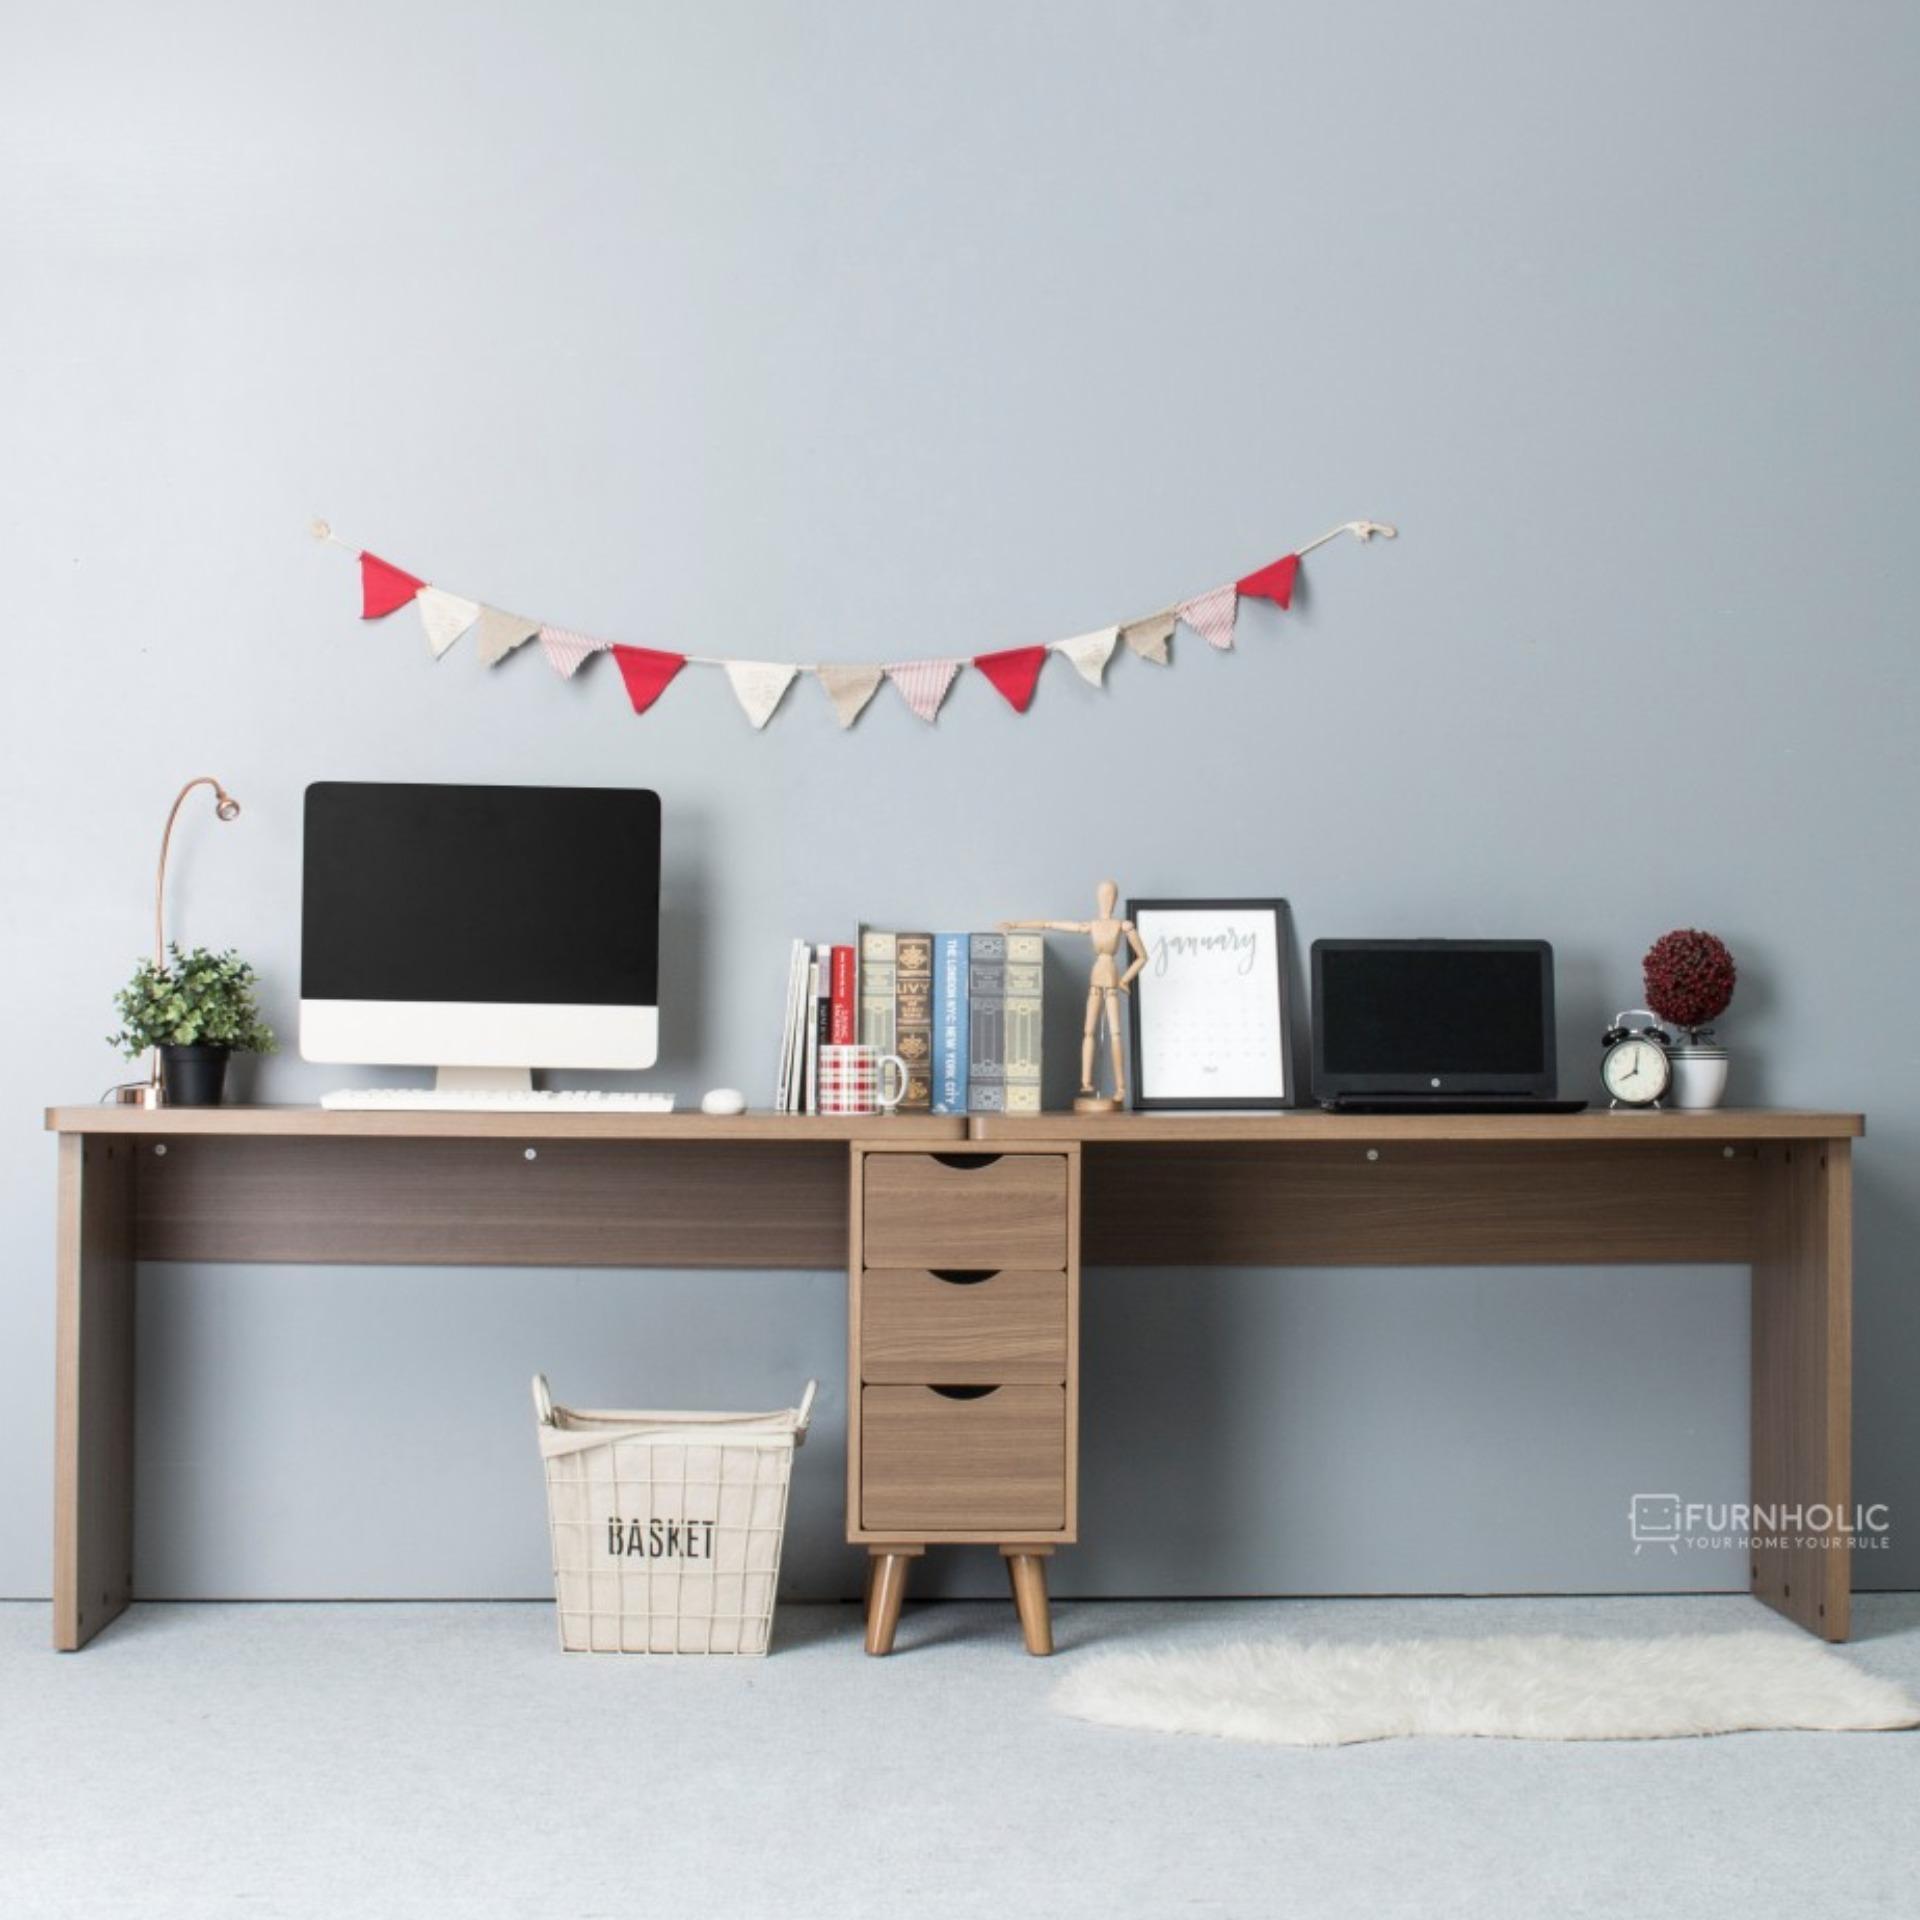 iFurnholic Thomas Smart Desk 240 Berkabinet Meja Kerja Coffee Brown Gratis Pengiriman Pulau